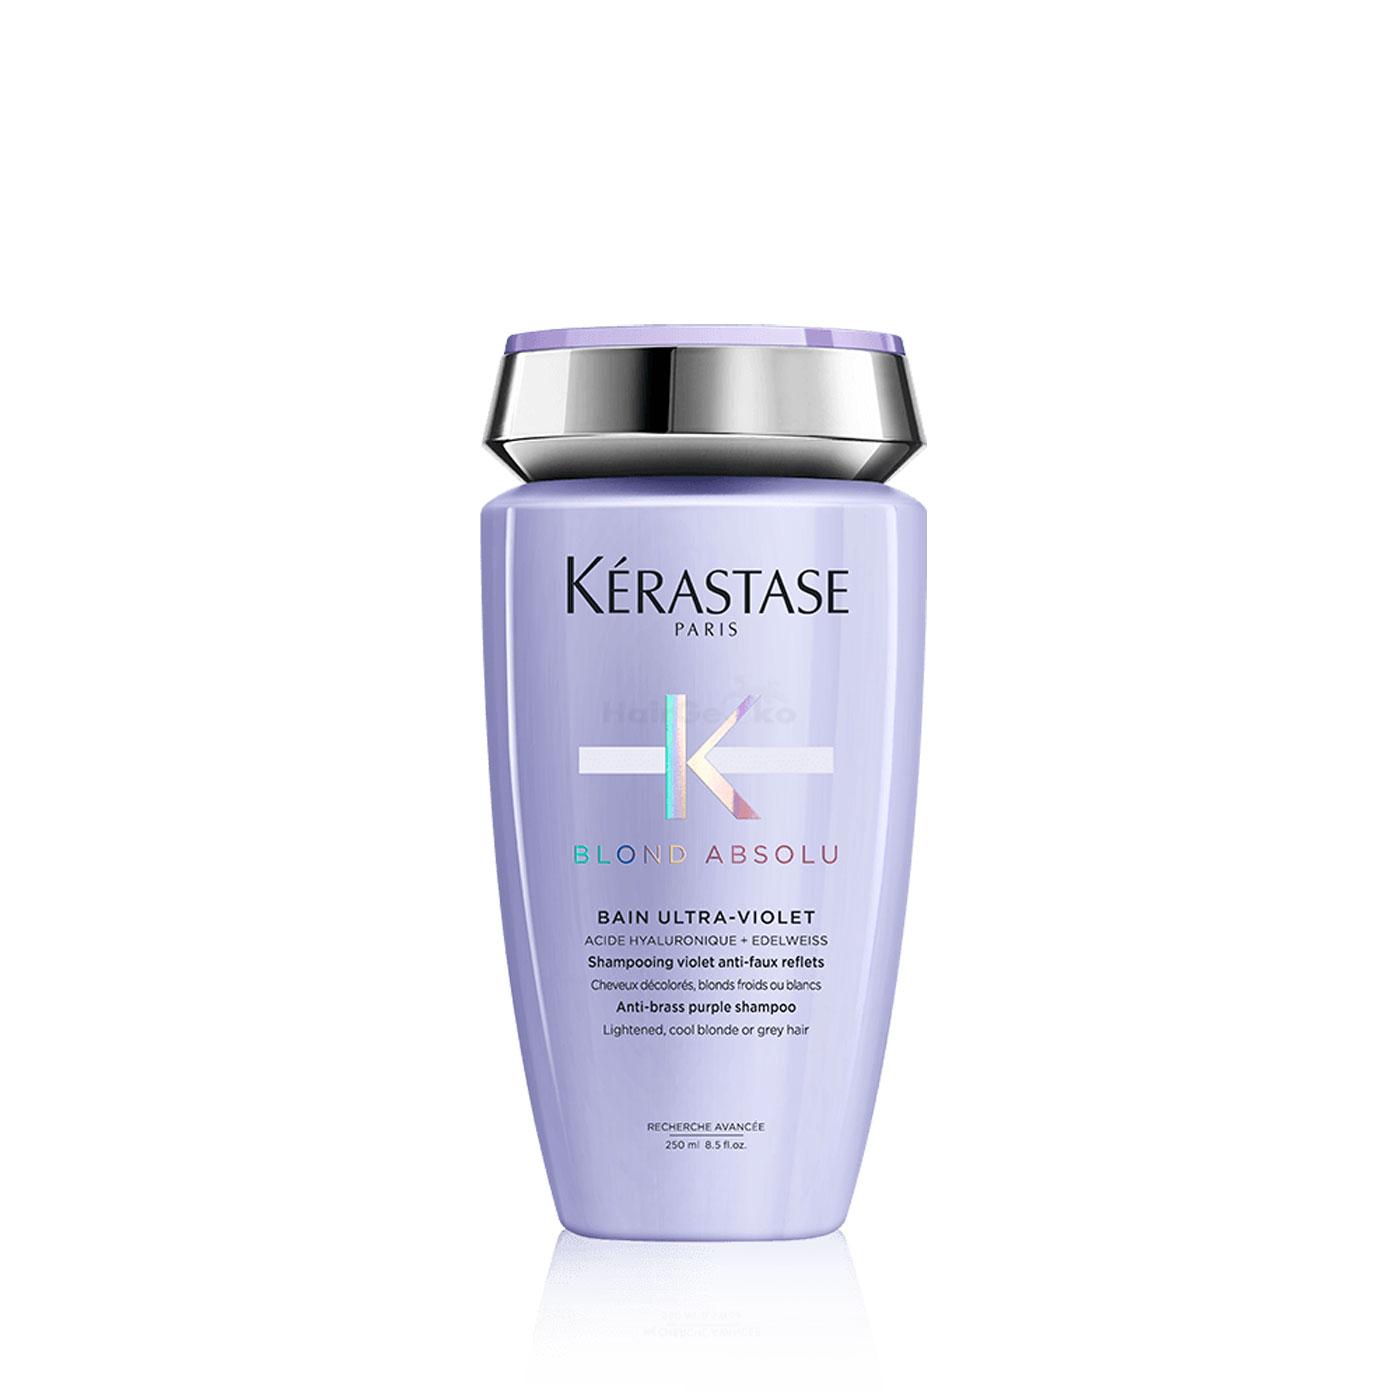 Kerastase Blond Absolu Bain Ultra-Violet Shampoo 250ml